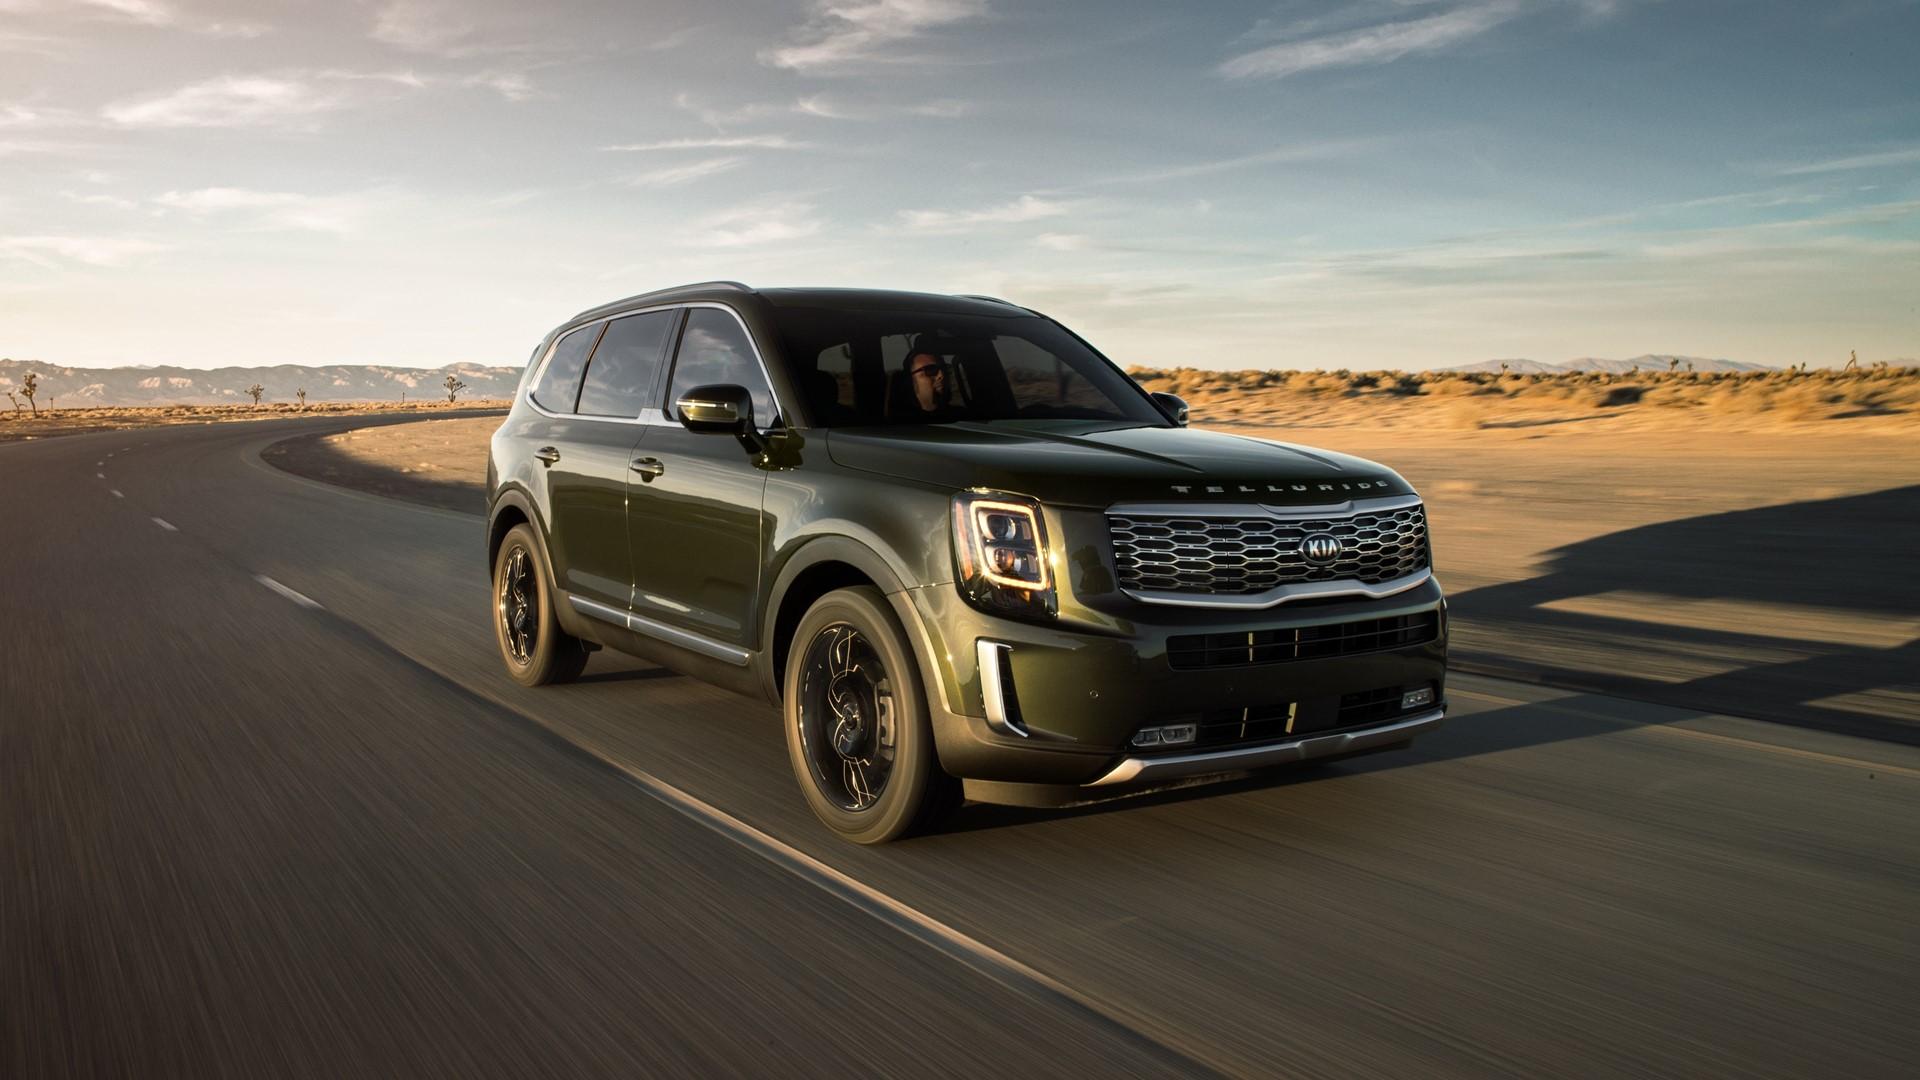 Kia Named 2020 Best Suv Brand By U S News World Report